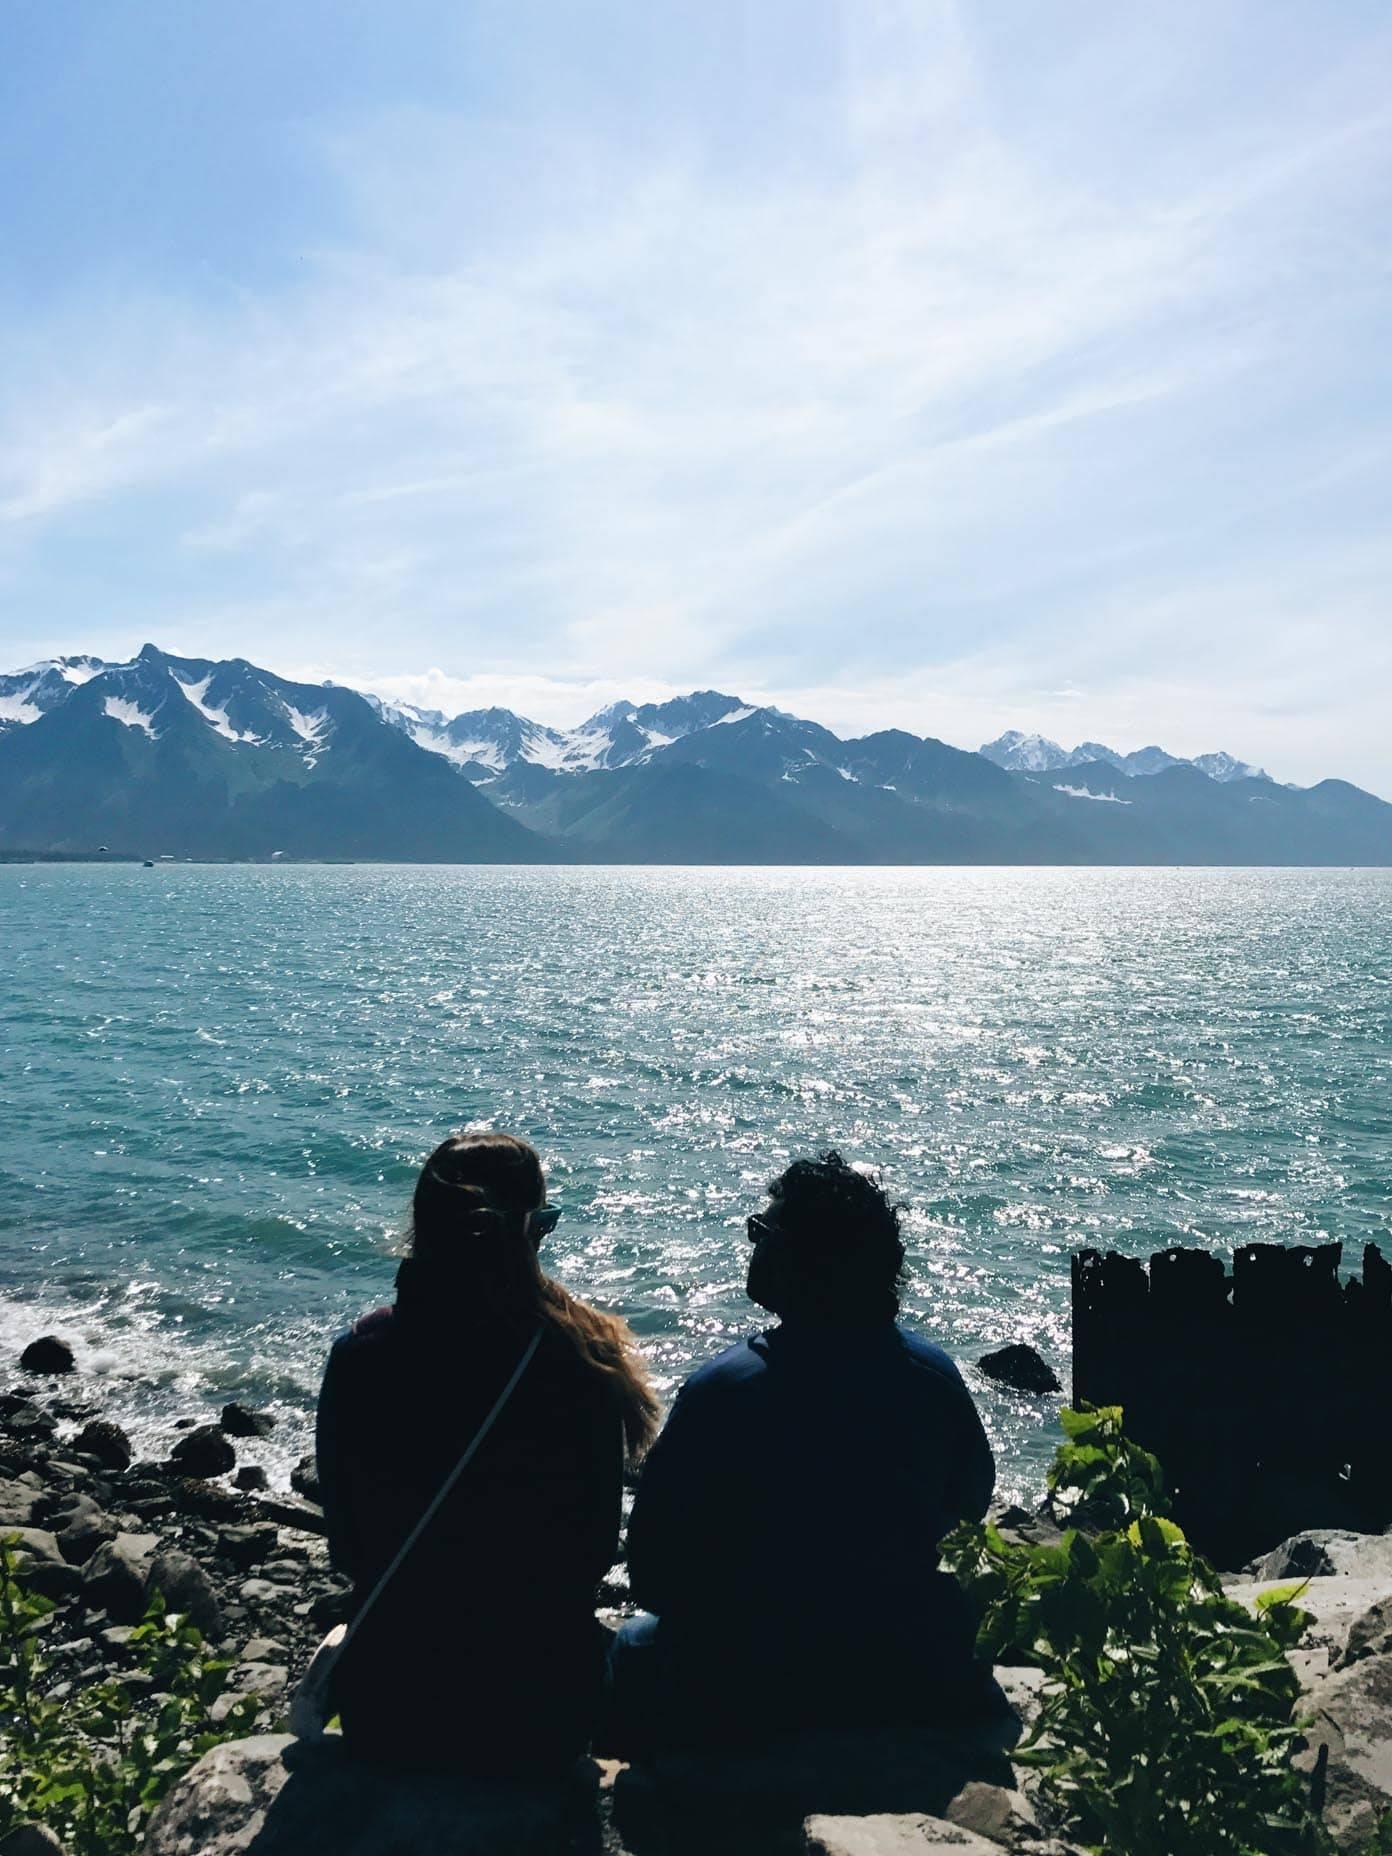 Alaska 25 One Thousand Miles of Alaska